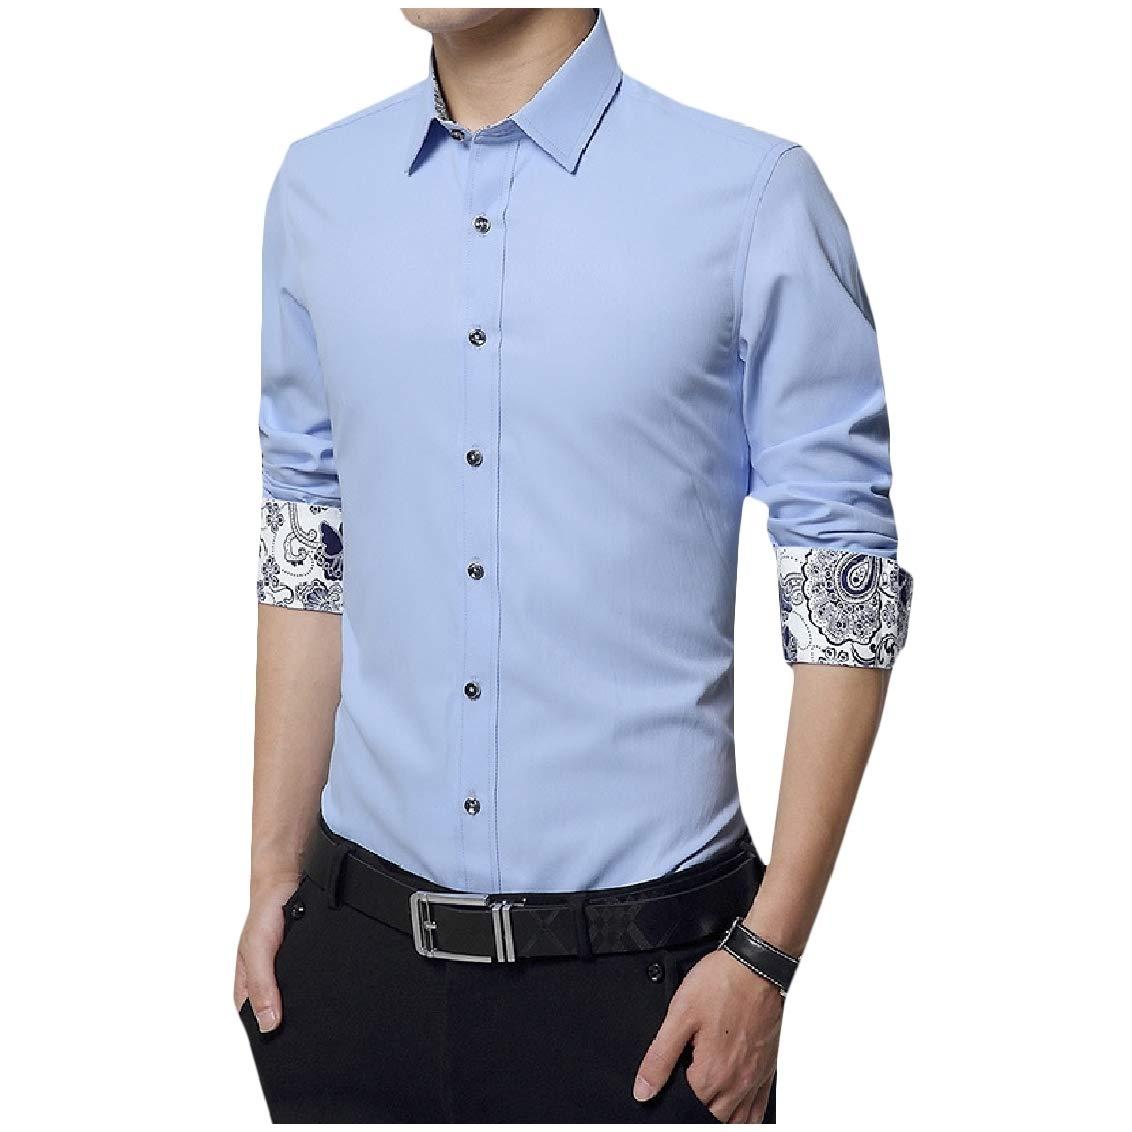 Fieer Mens Button Floral Printed Stitch Plus Size Lapel Fit T-Shirts Shirt